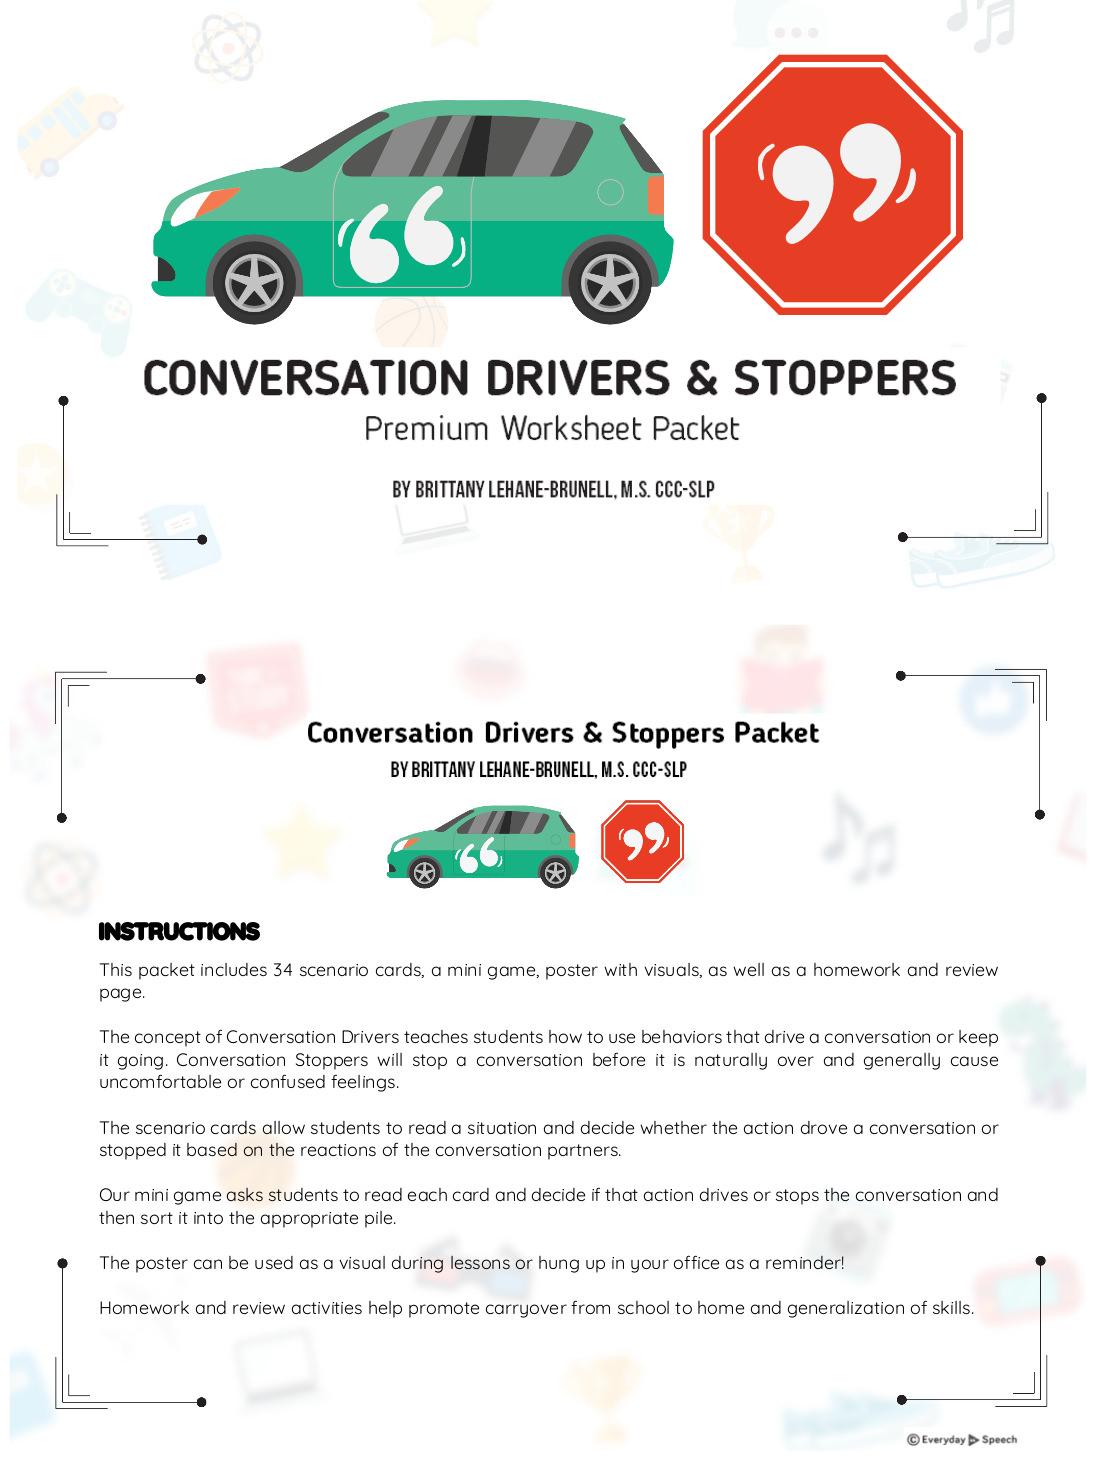 Workbooks speech therapy workbooks : Conversation Drivers & Stoppers Premium Packet - Everyday Speech ...